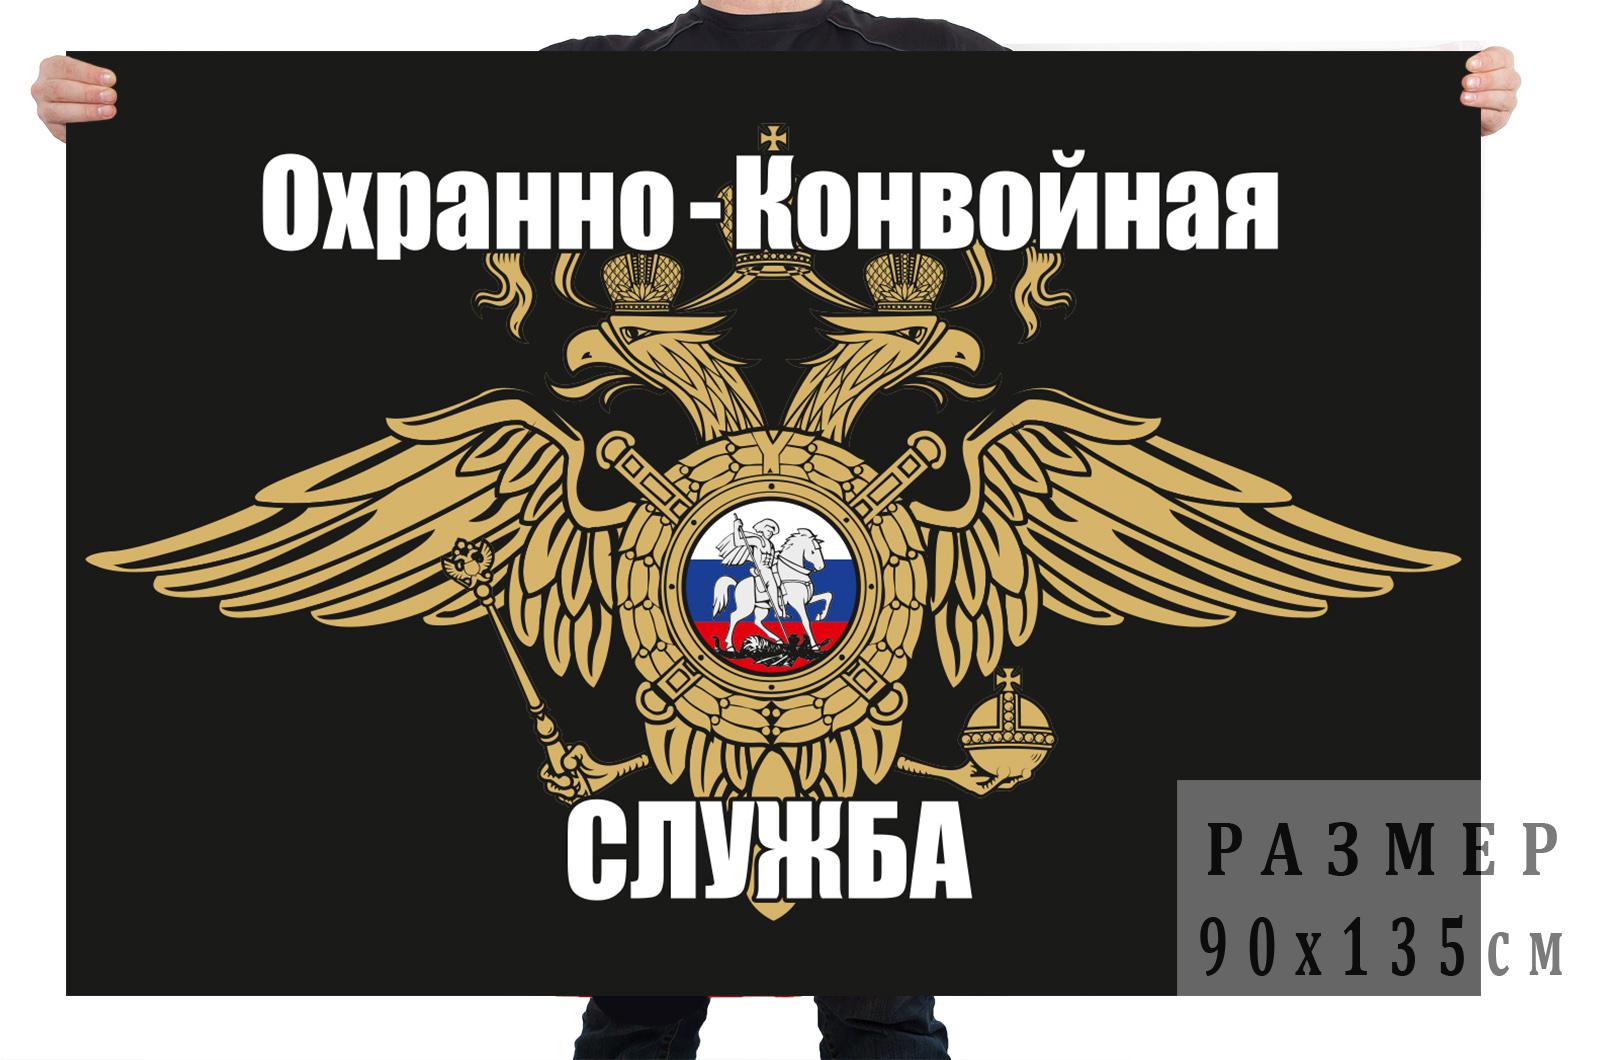 Флаг охранно-конвойной службы